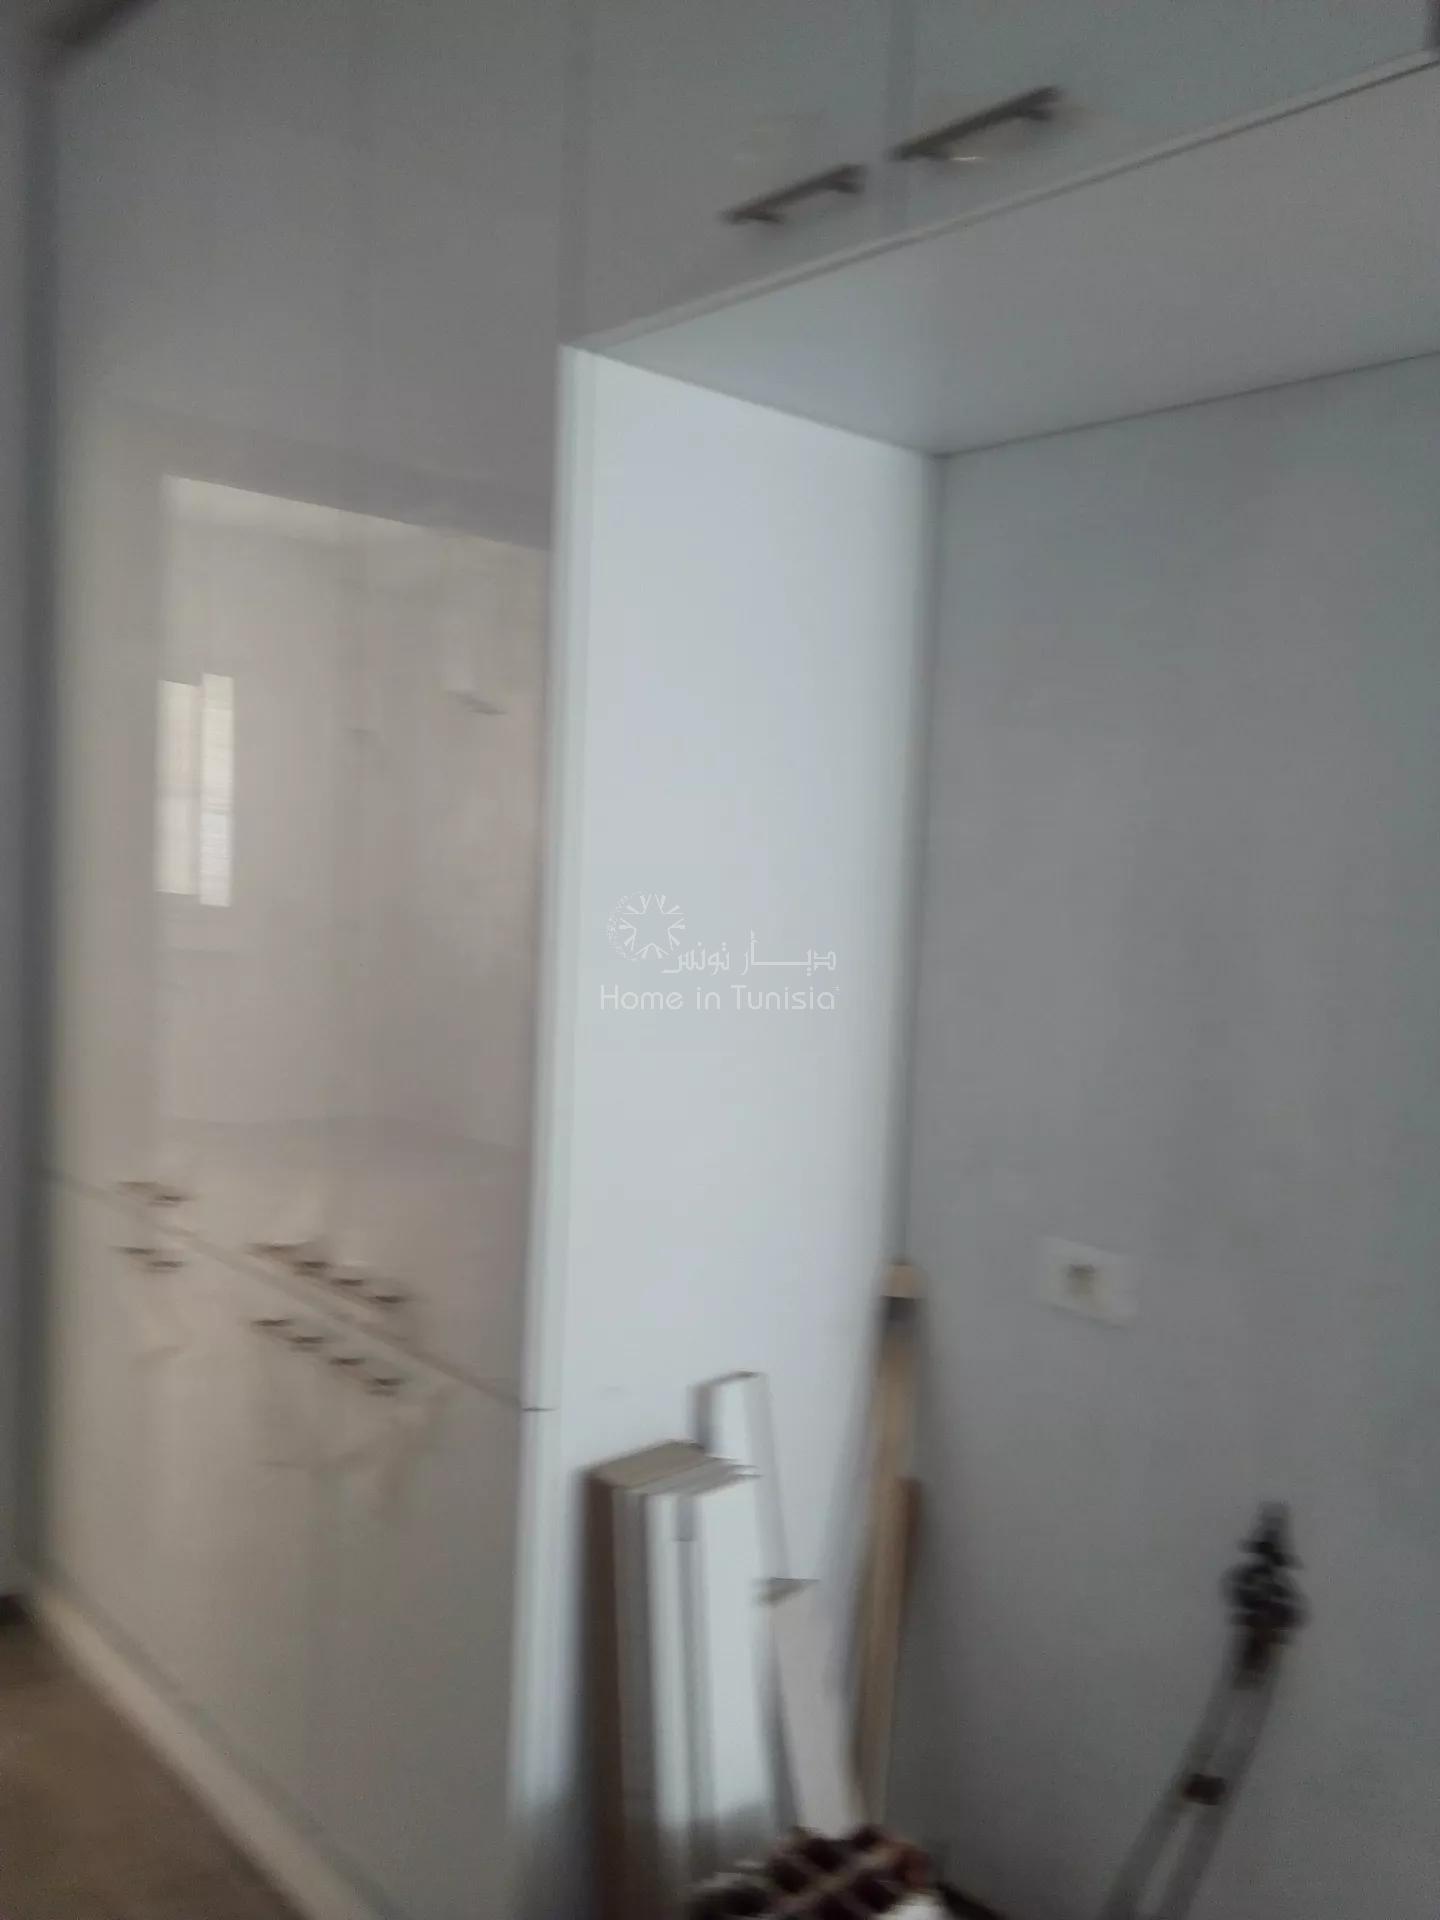 Location Appartement - La Marsa - Tunisie